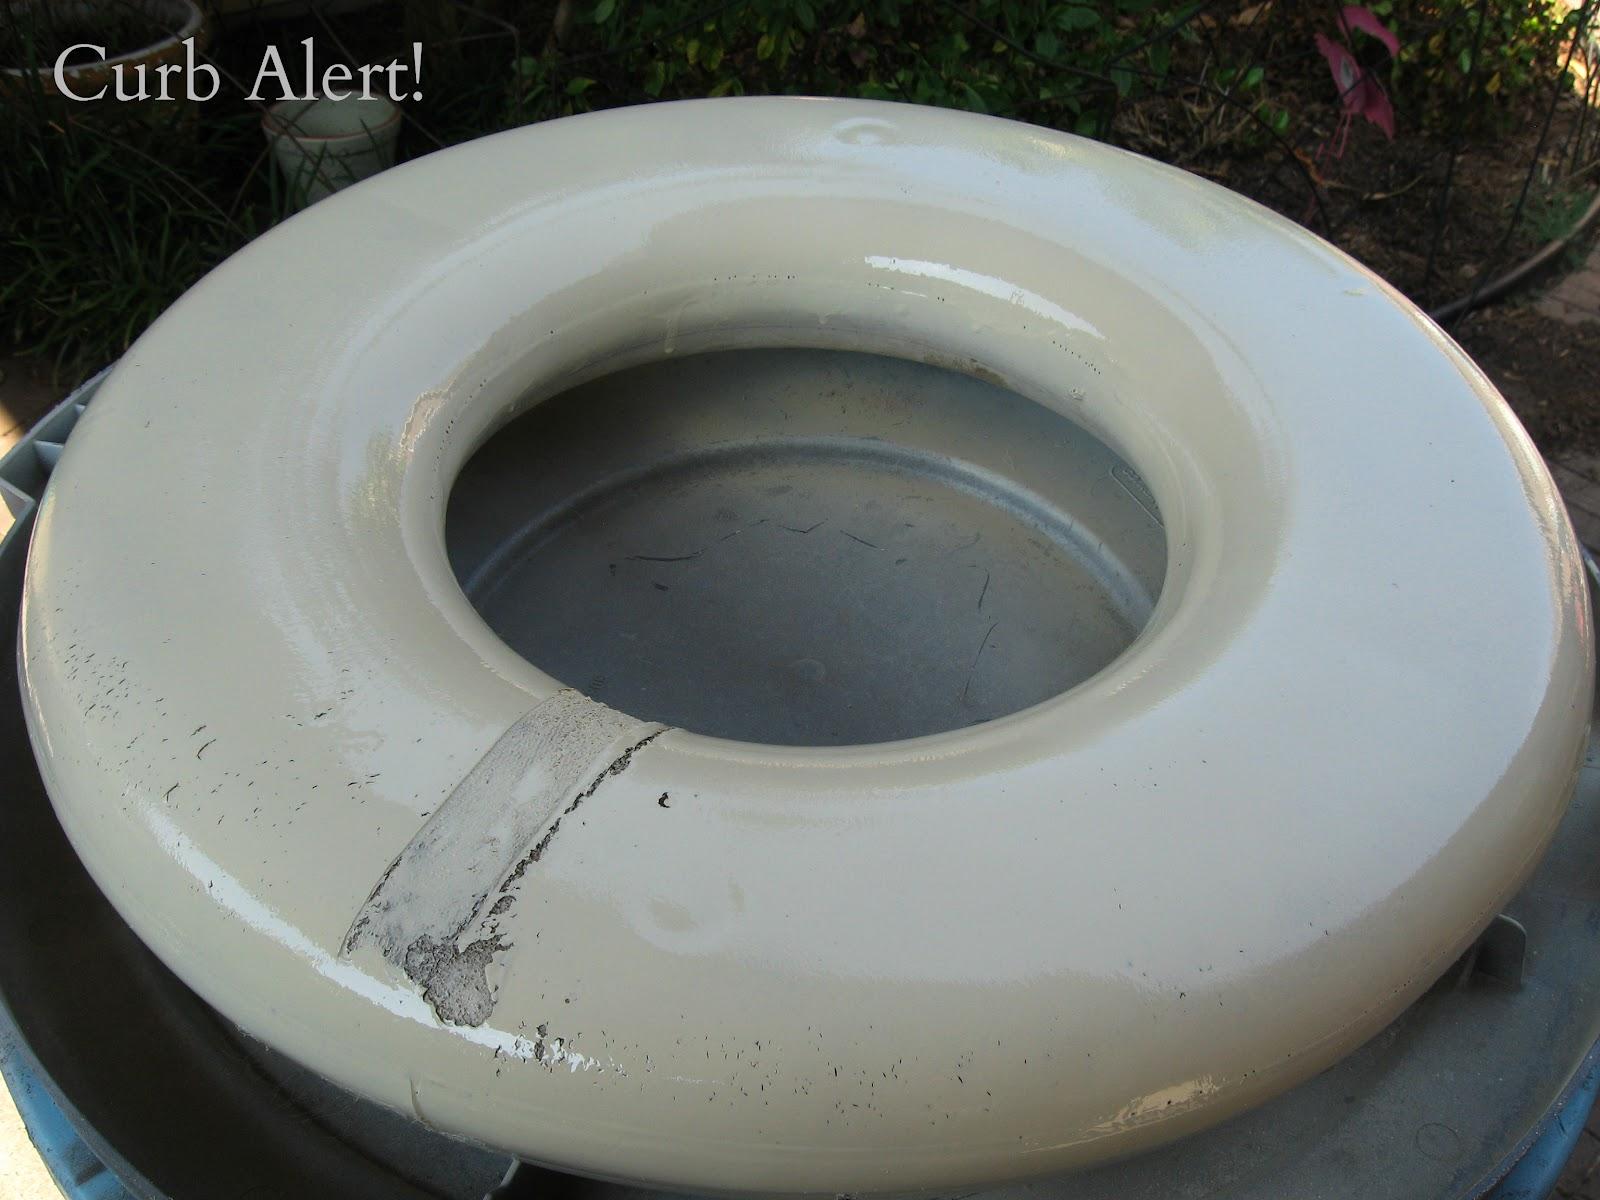 http://2.bp.blogspot.com/-9Wq8YFIX9TM/T9lm4cGGQwI/AAAAAAAAEOc/EbycHRulObY/s1600/Lifesaving+Ring+3.jpg